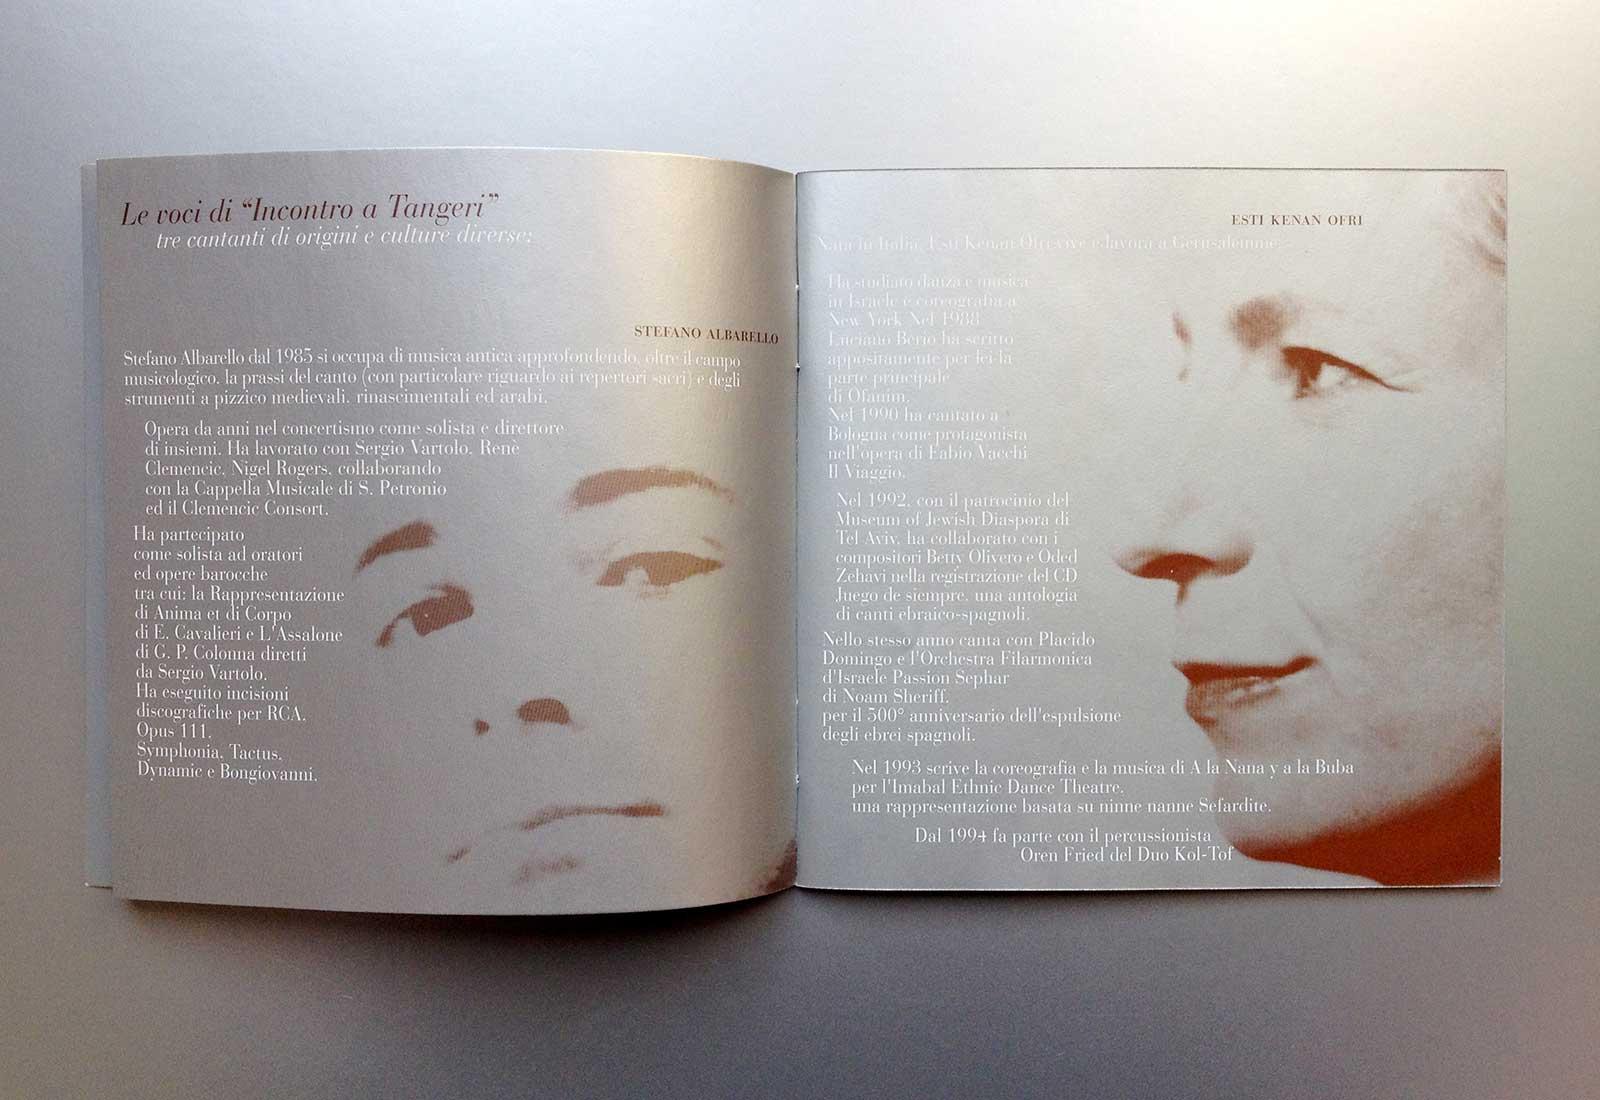 CD-INCONTRO-A-TANGERI-libretto-3